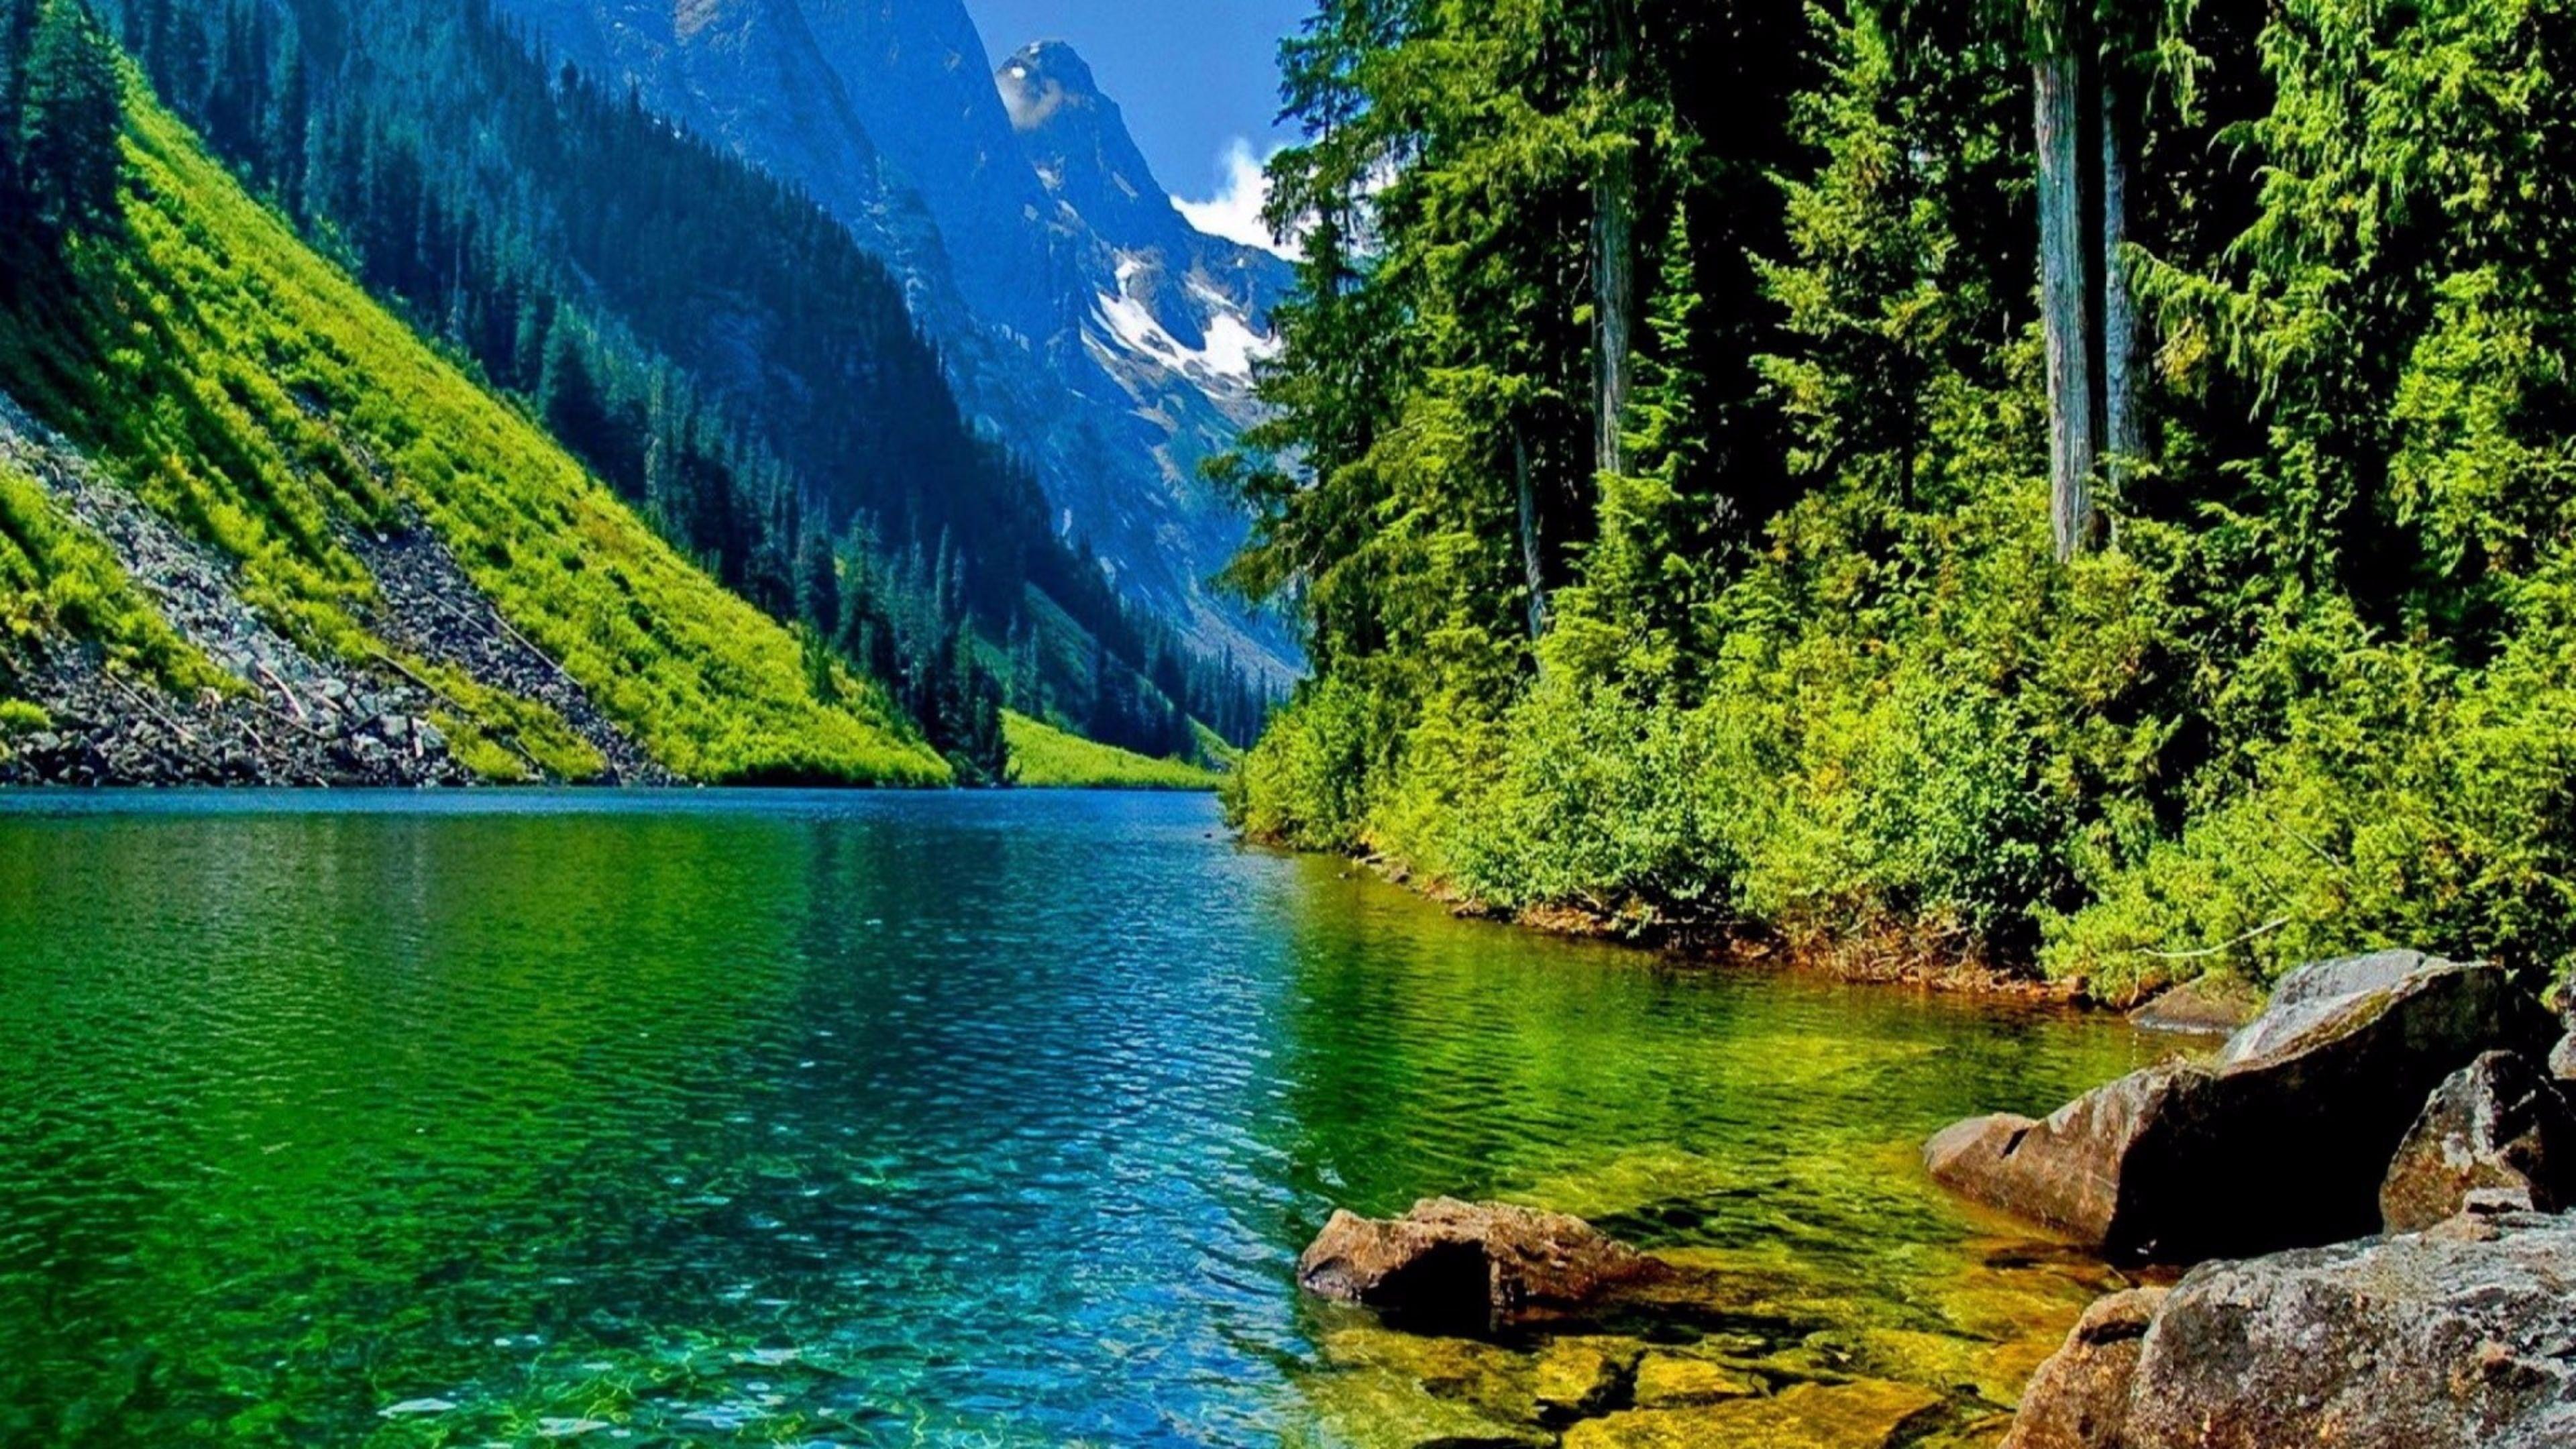 4K Nature Pics